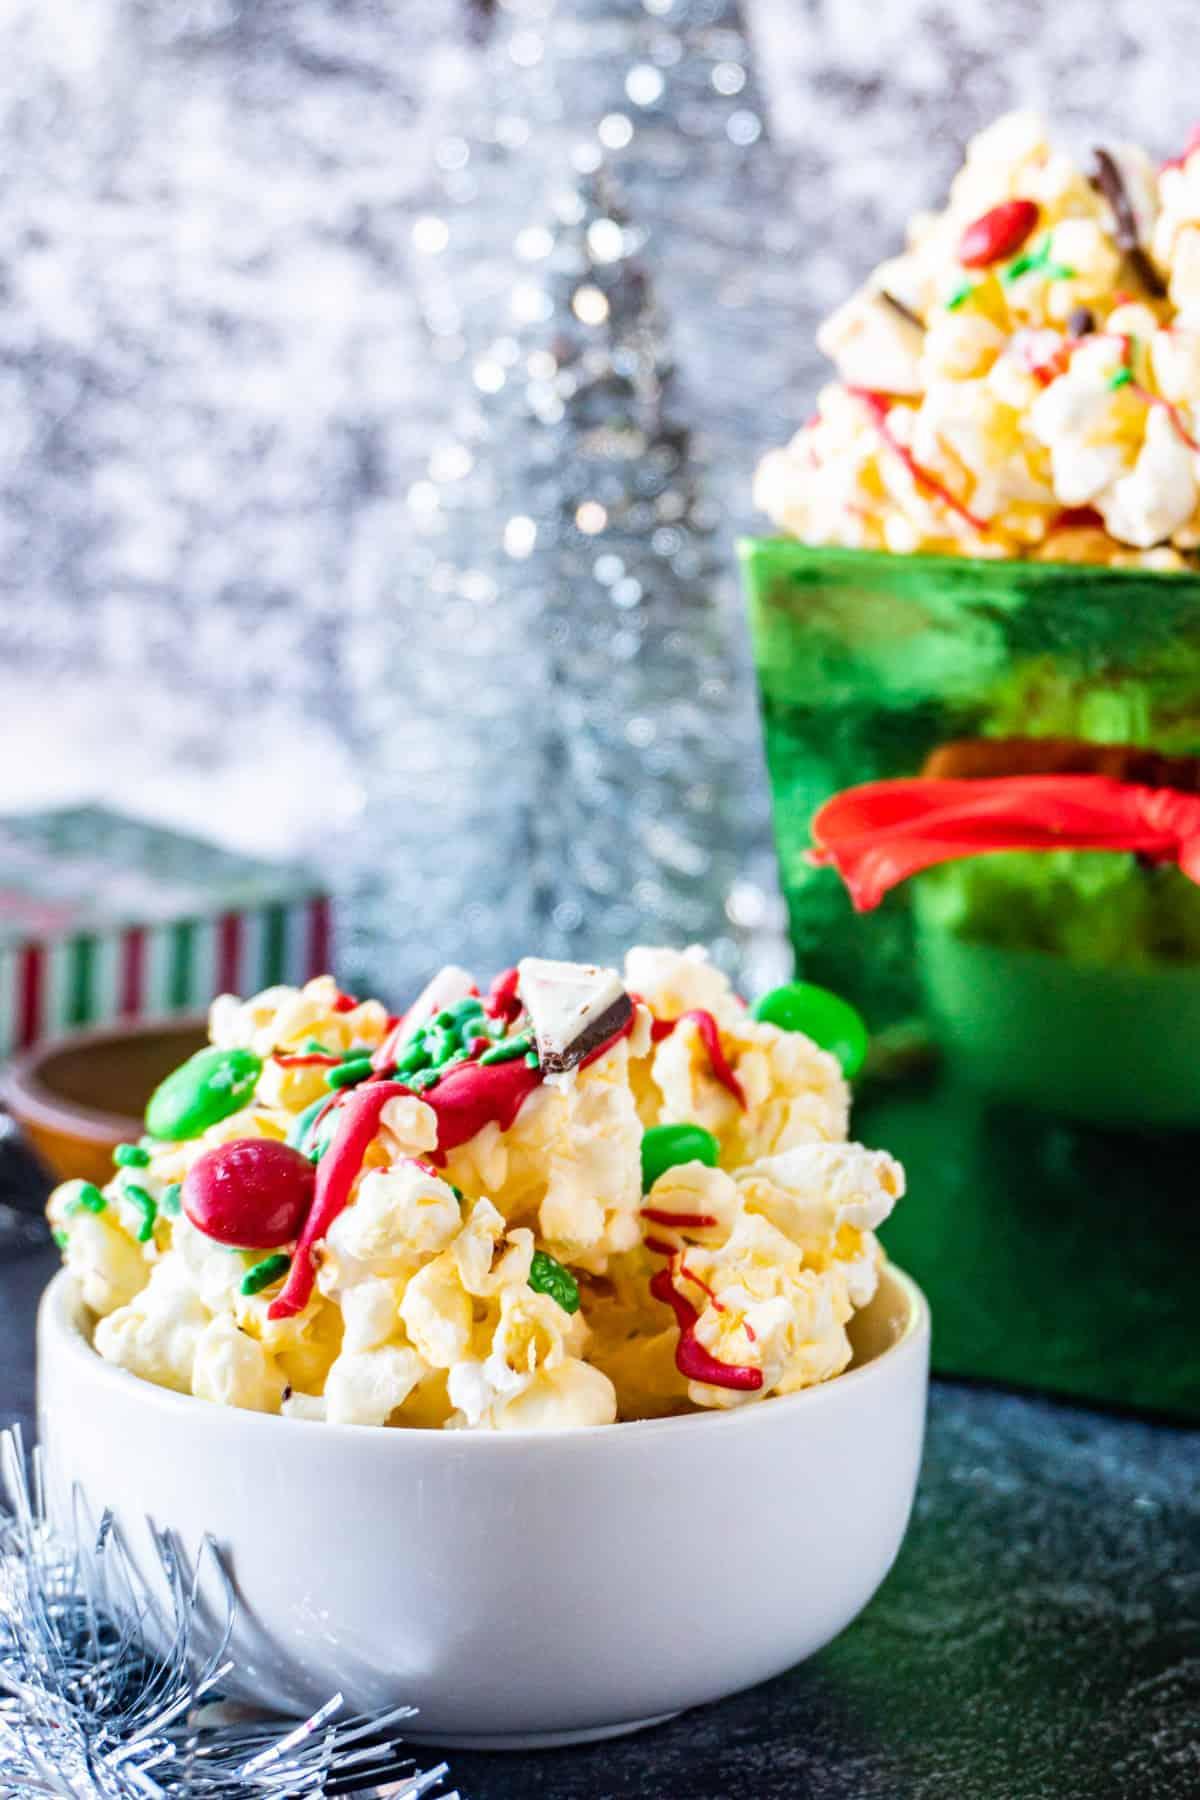 Christmas popcorn in bowl